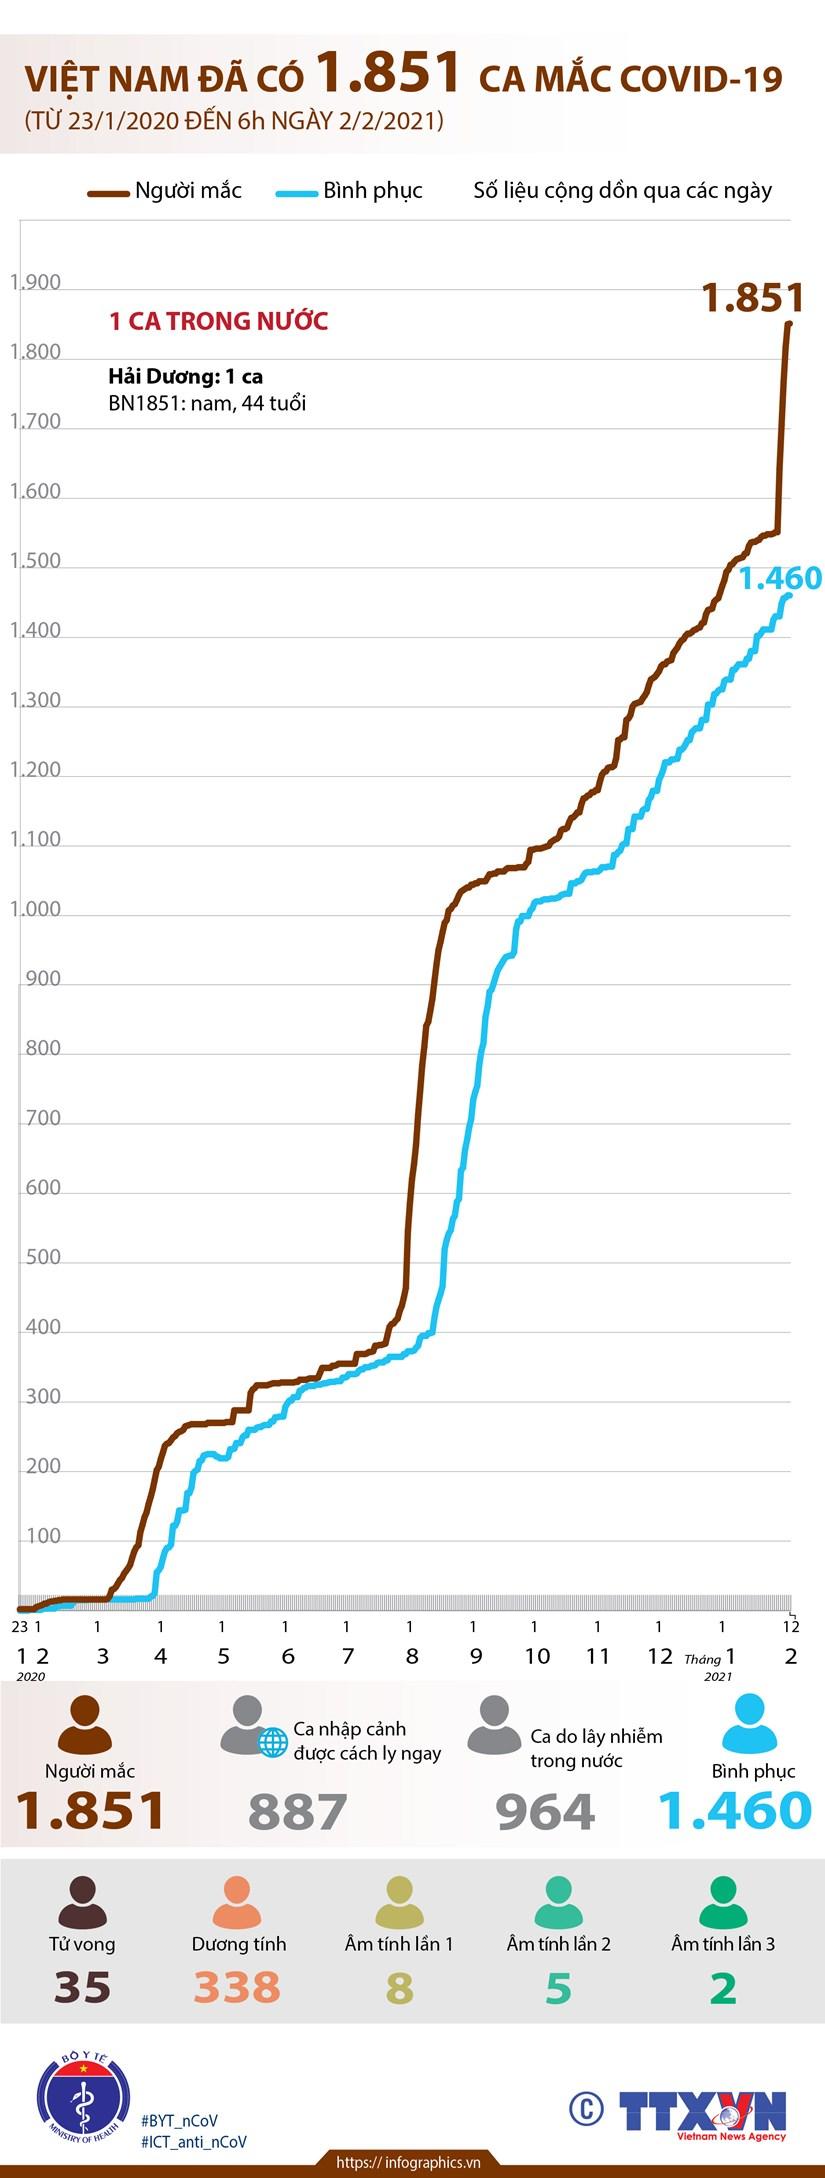 [Infographics] Viet Nam da co 1.851 ca mac dich benh COVID-19 hinh anh 1